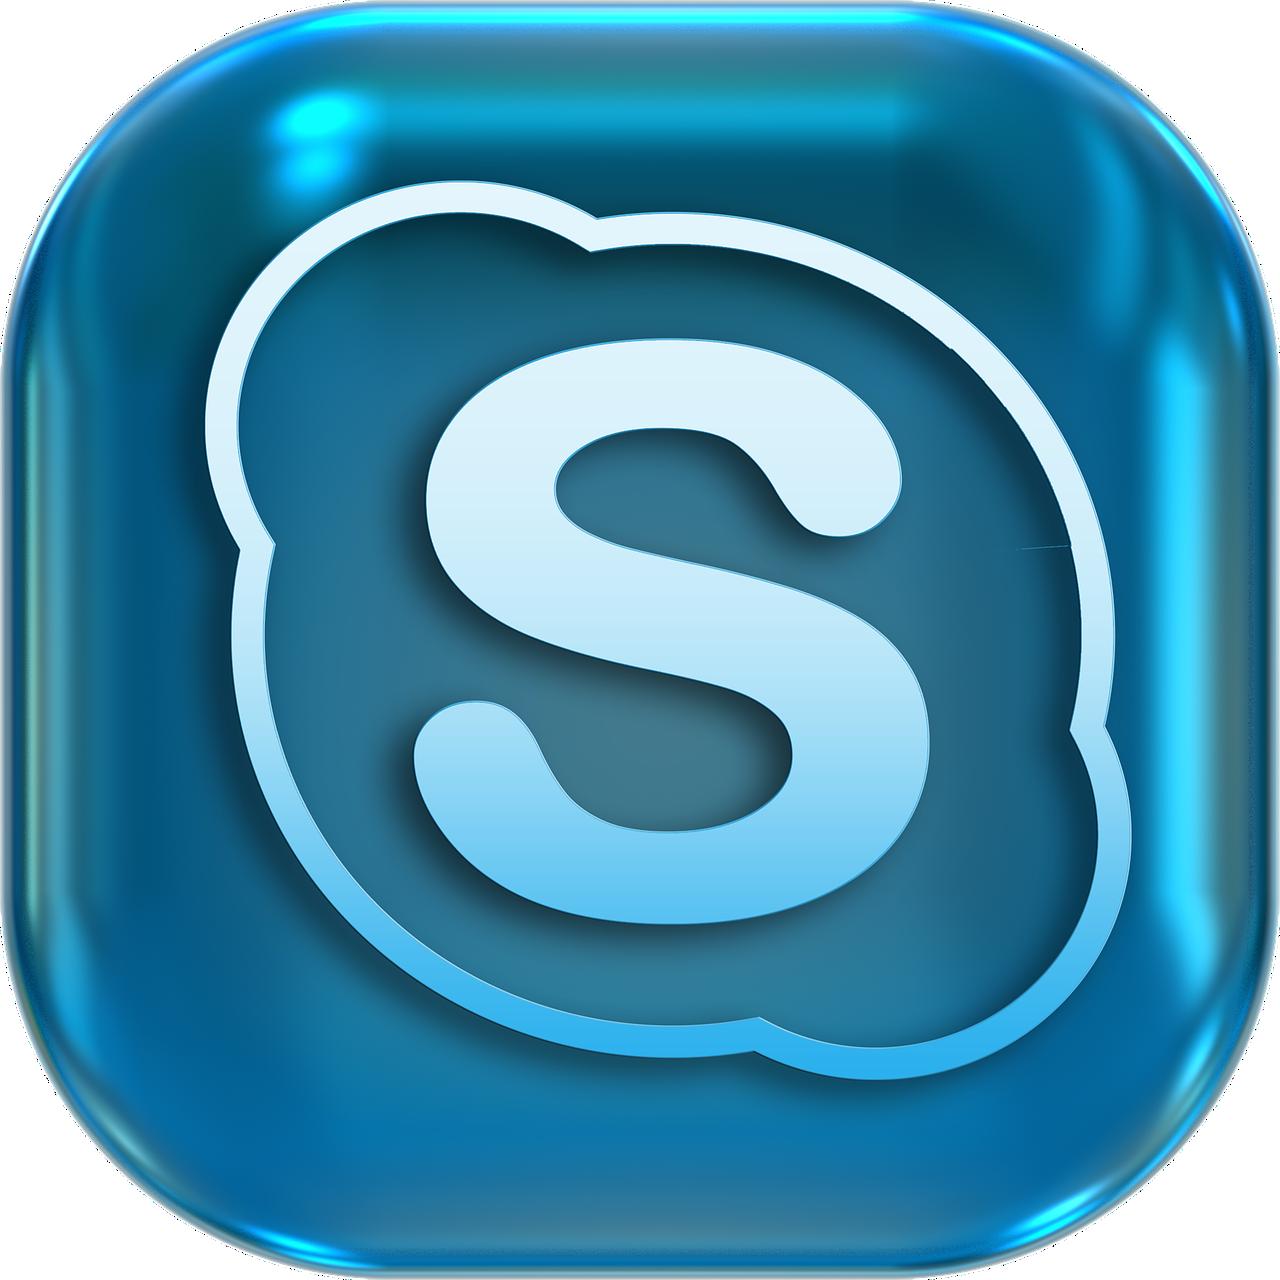 icons, symbols, skype